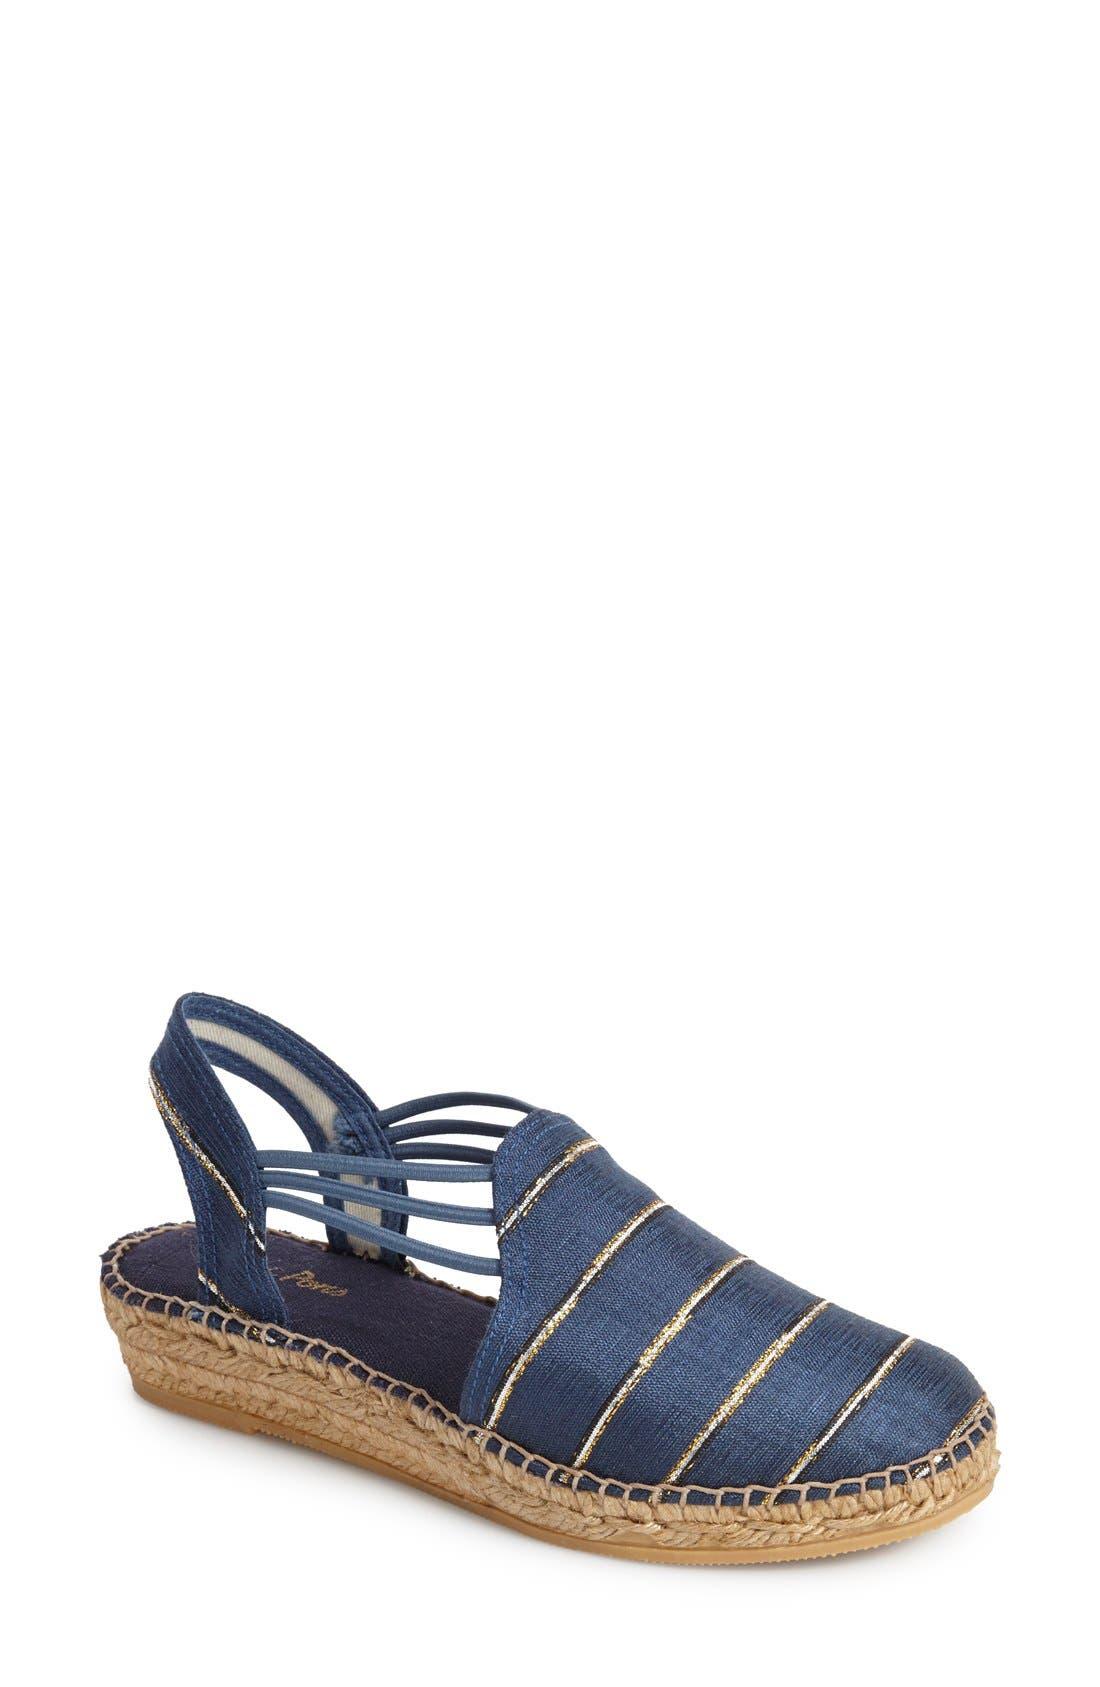 Alternate Image 1 Selected - Toni Pons 'Nantes' Silk Stripe Sandal (Women)